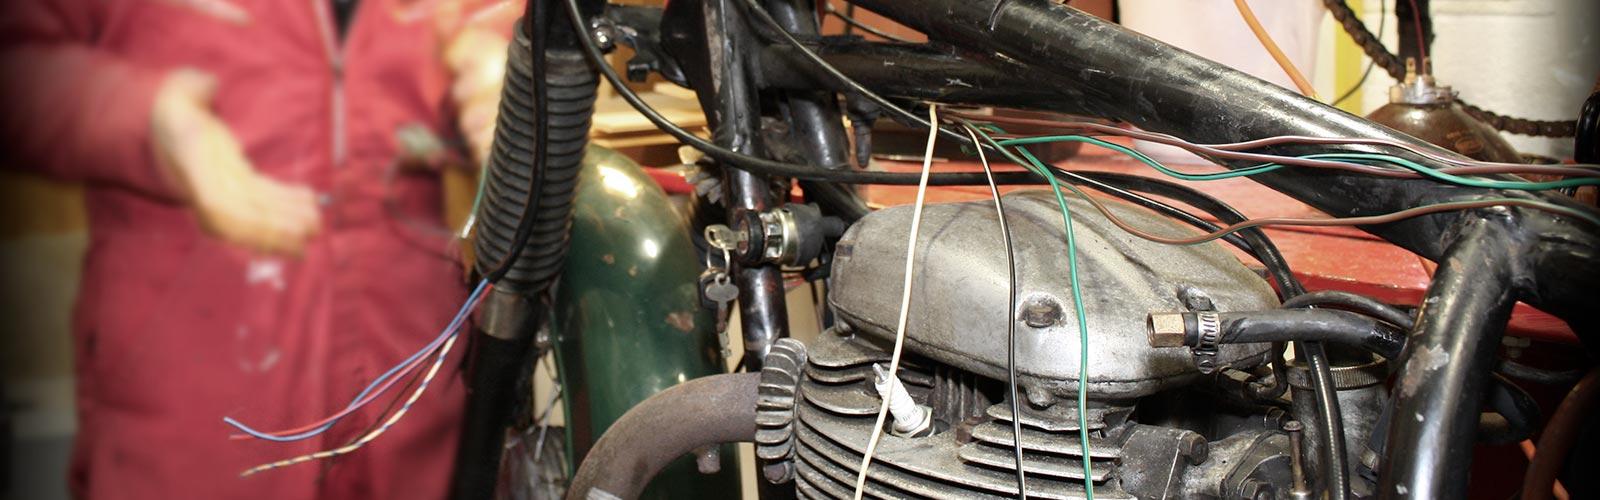 hight resolution of custom harnes wiring loom